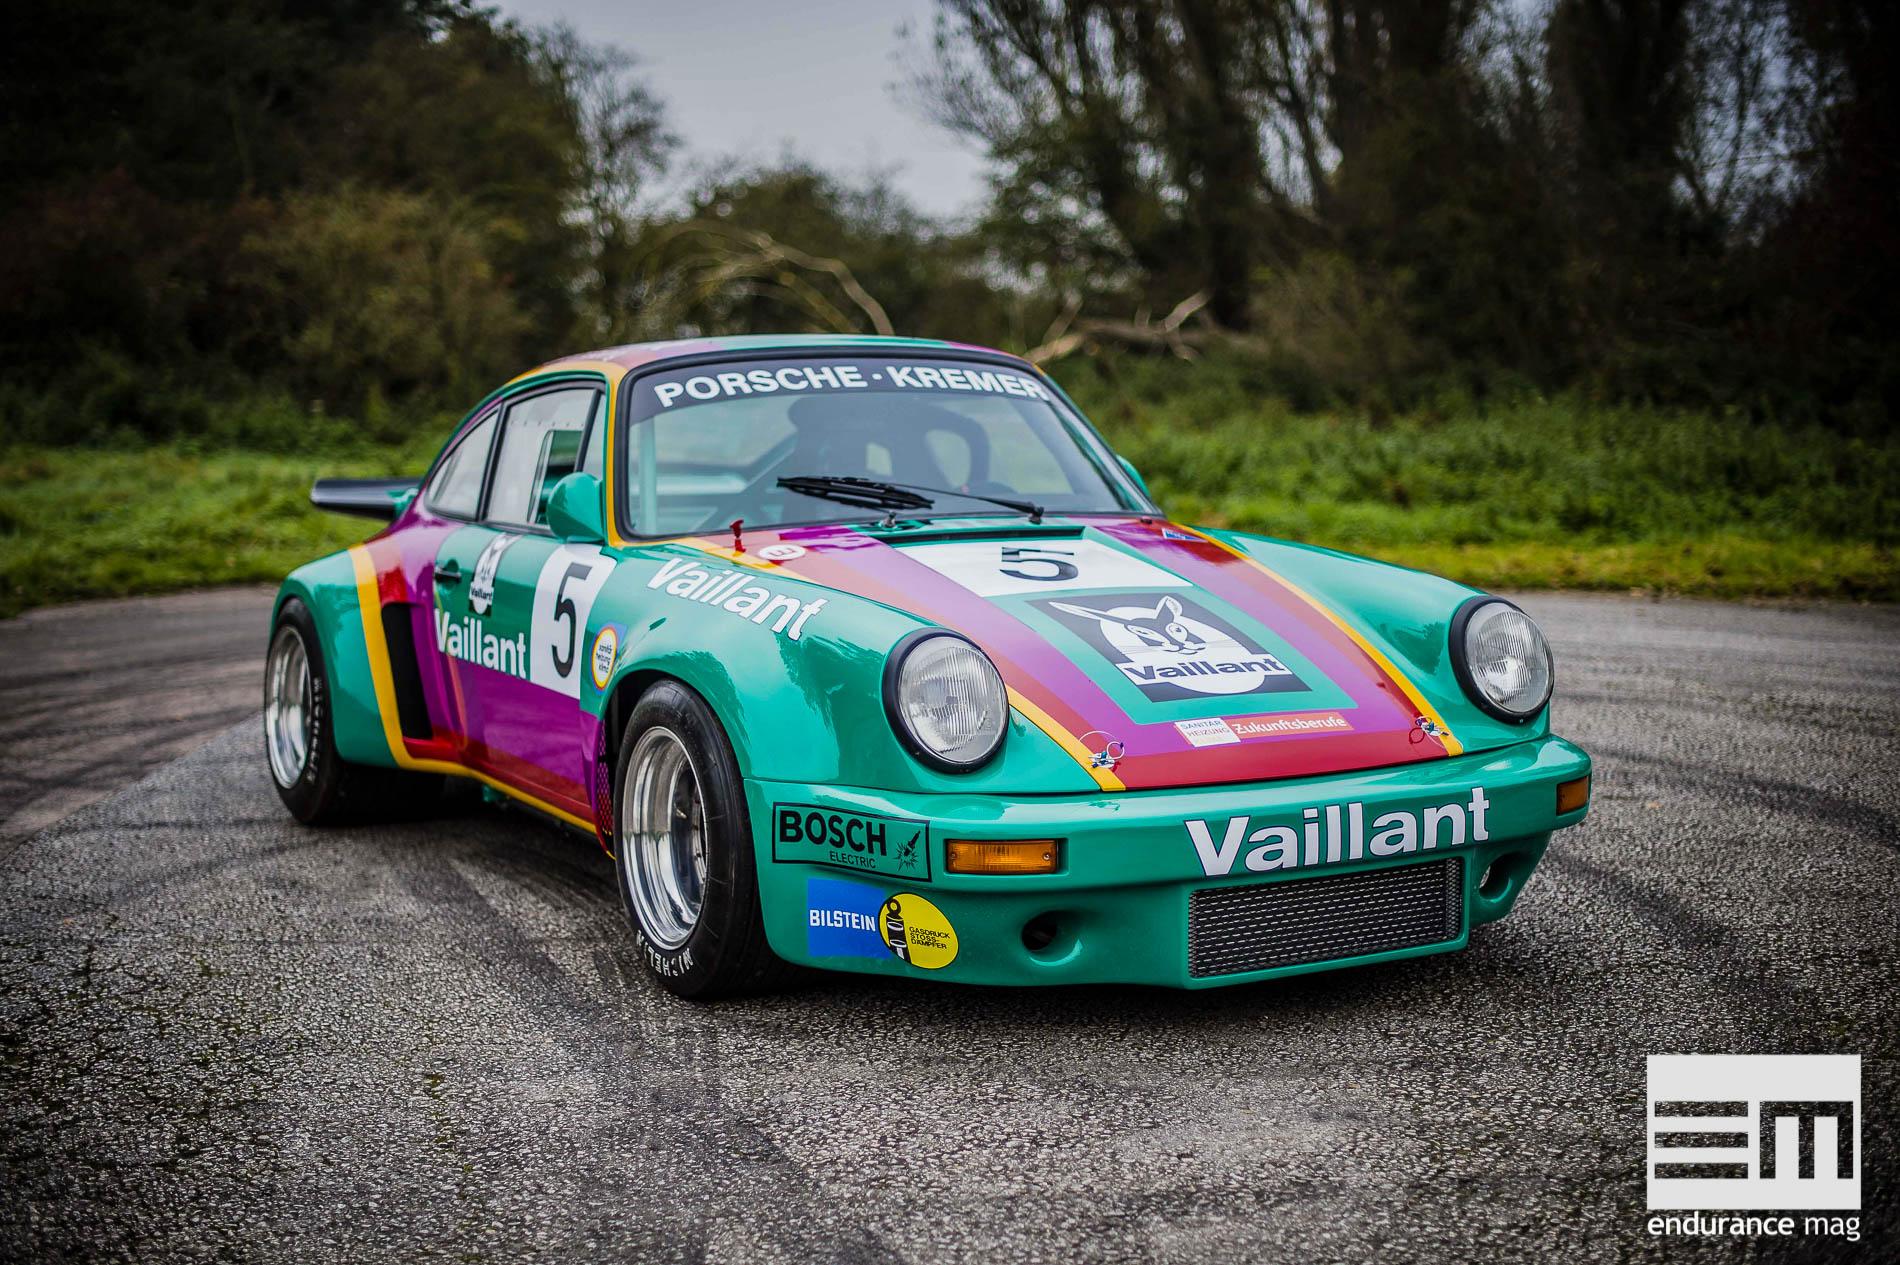 Porsche 911 carrera RSR Replica «Vaillant» 24 Heures du Mans 1975